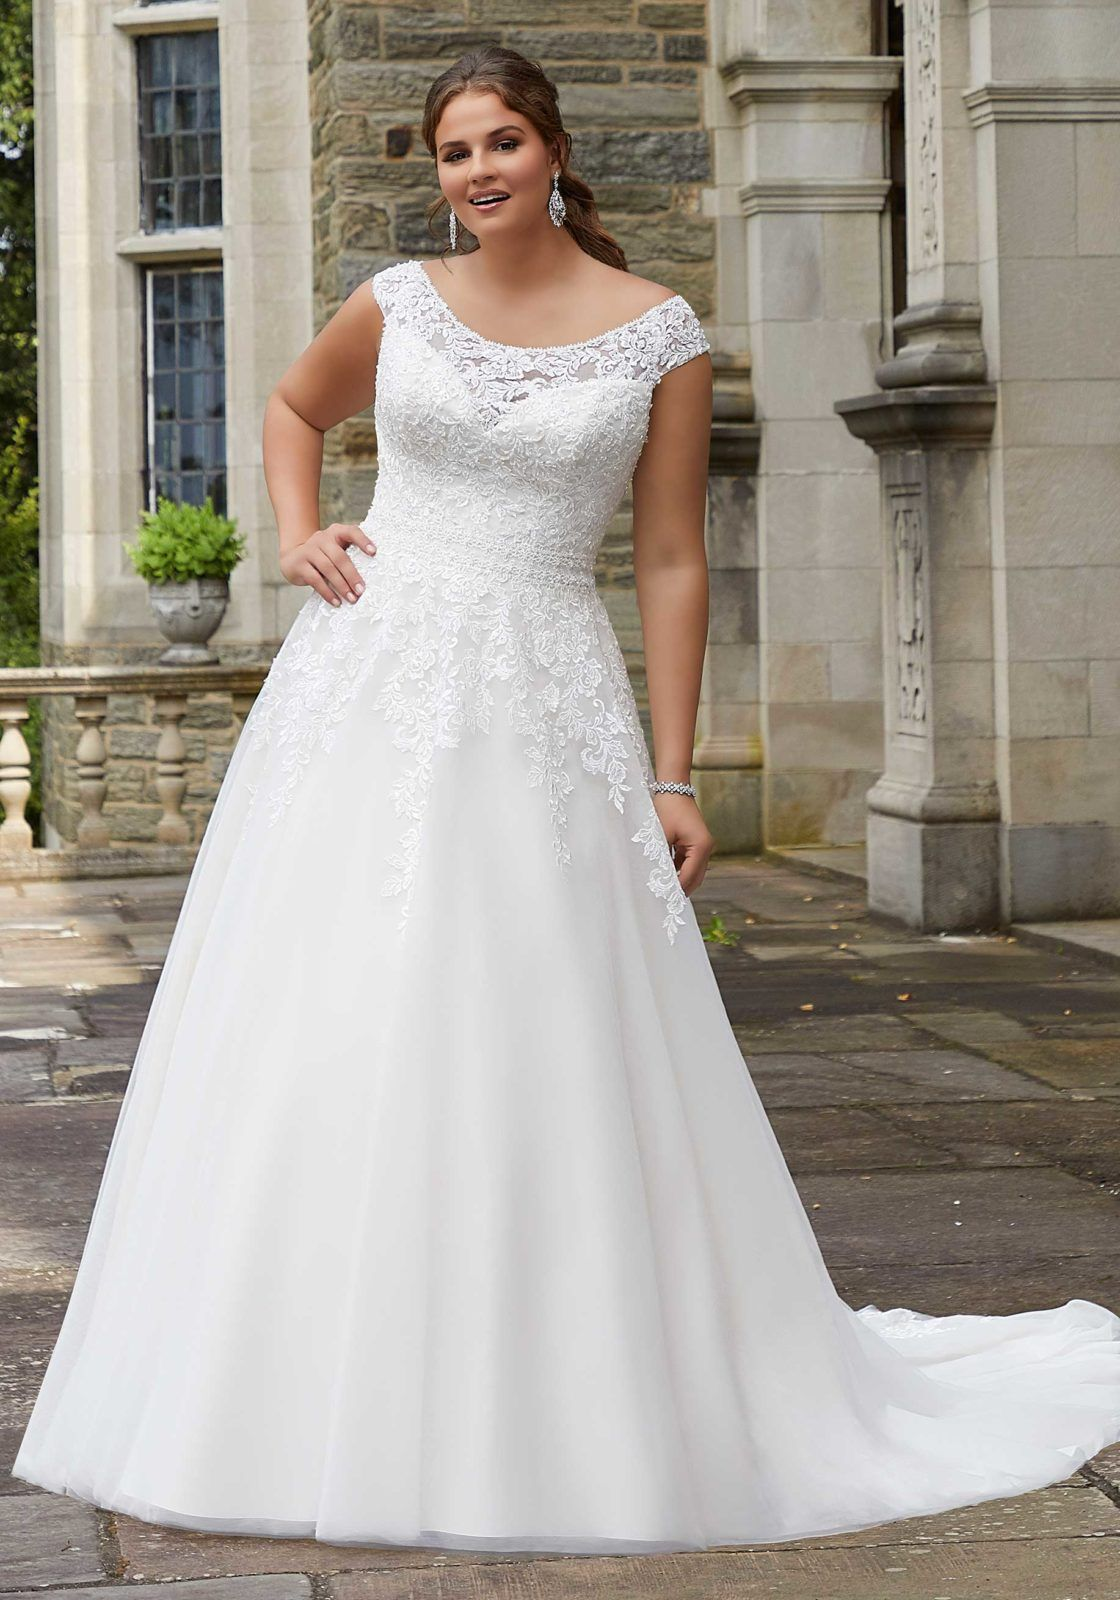 Susan Wedding Dress Morilee Plus size bridal dresses